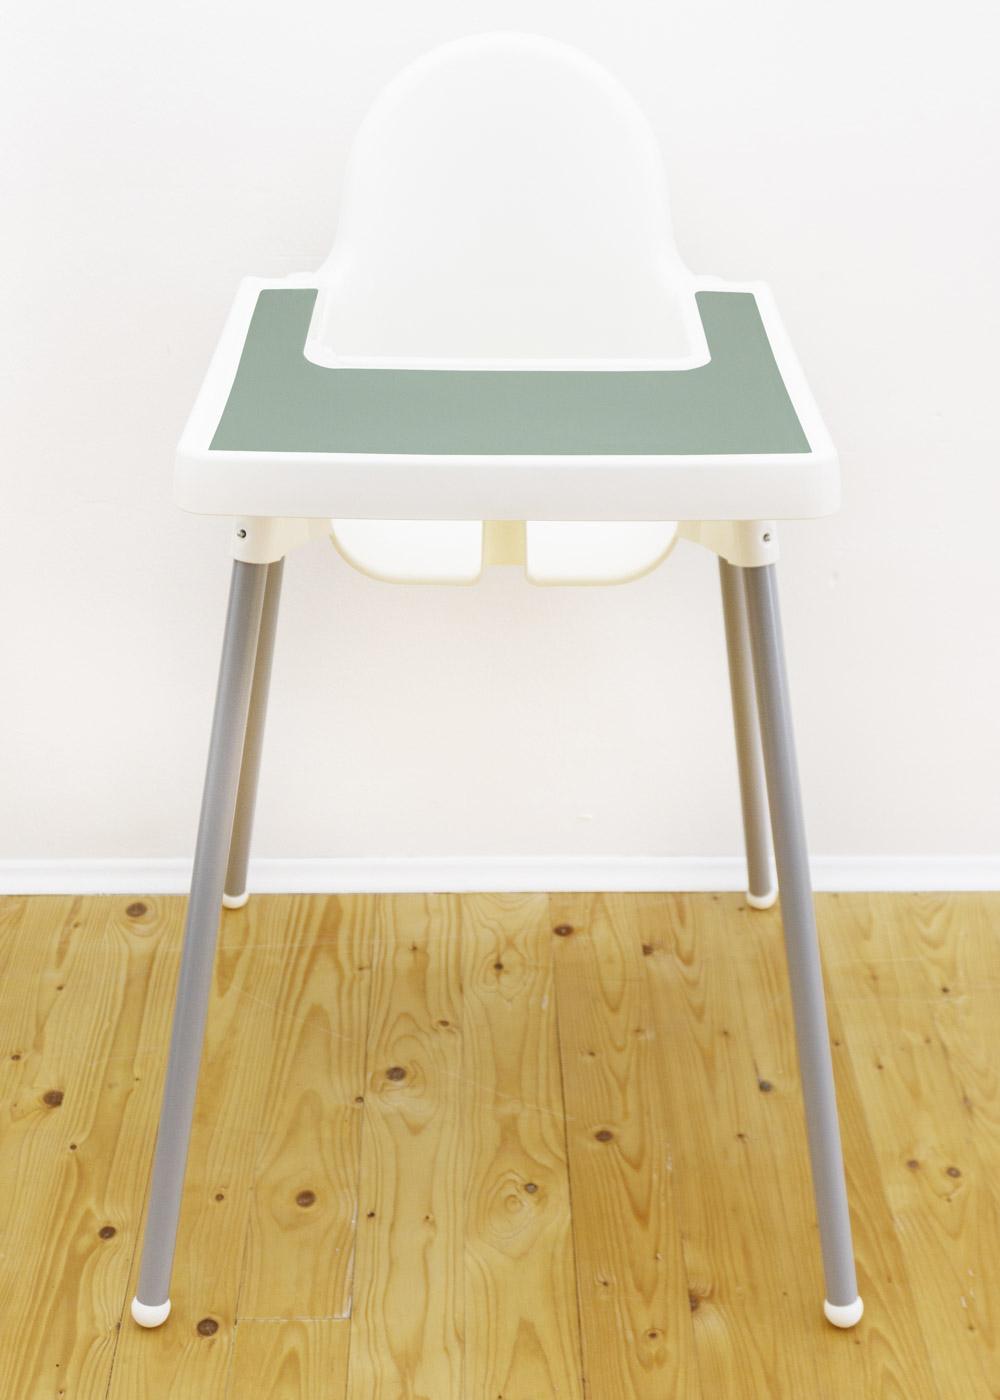 Silikonmatte Antilop Hochstuhl Eukalyptus Stuhl